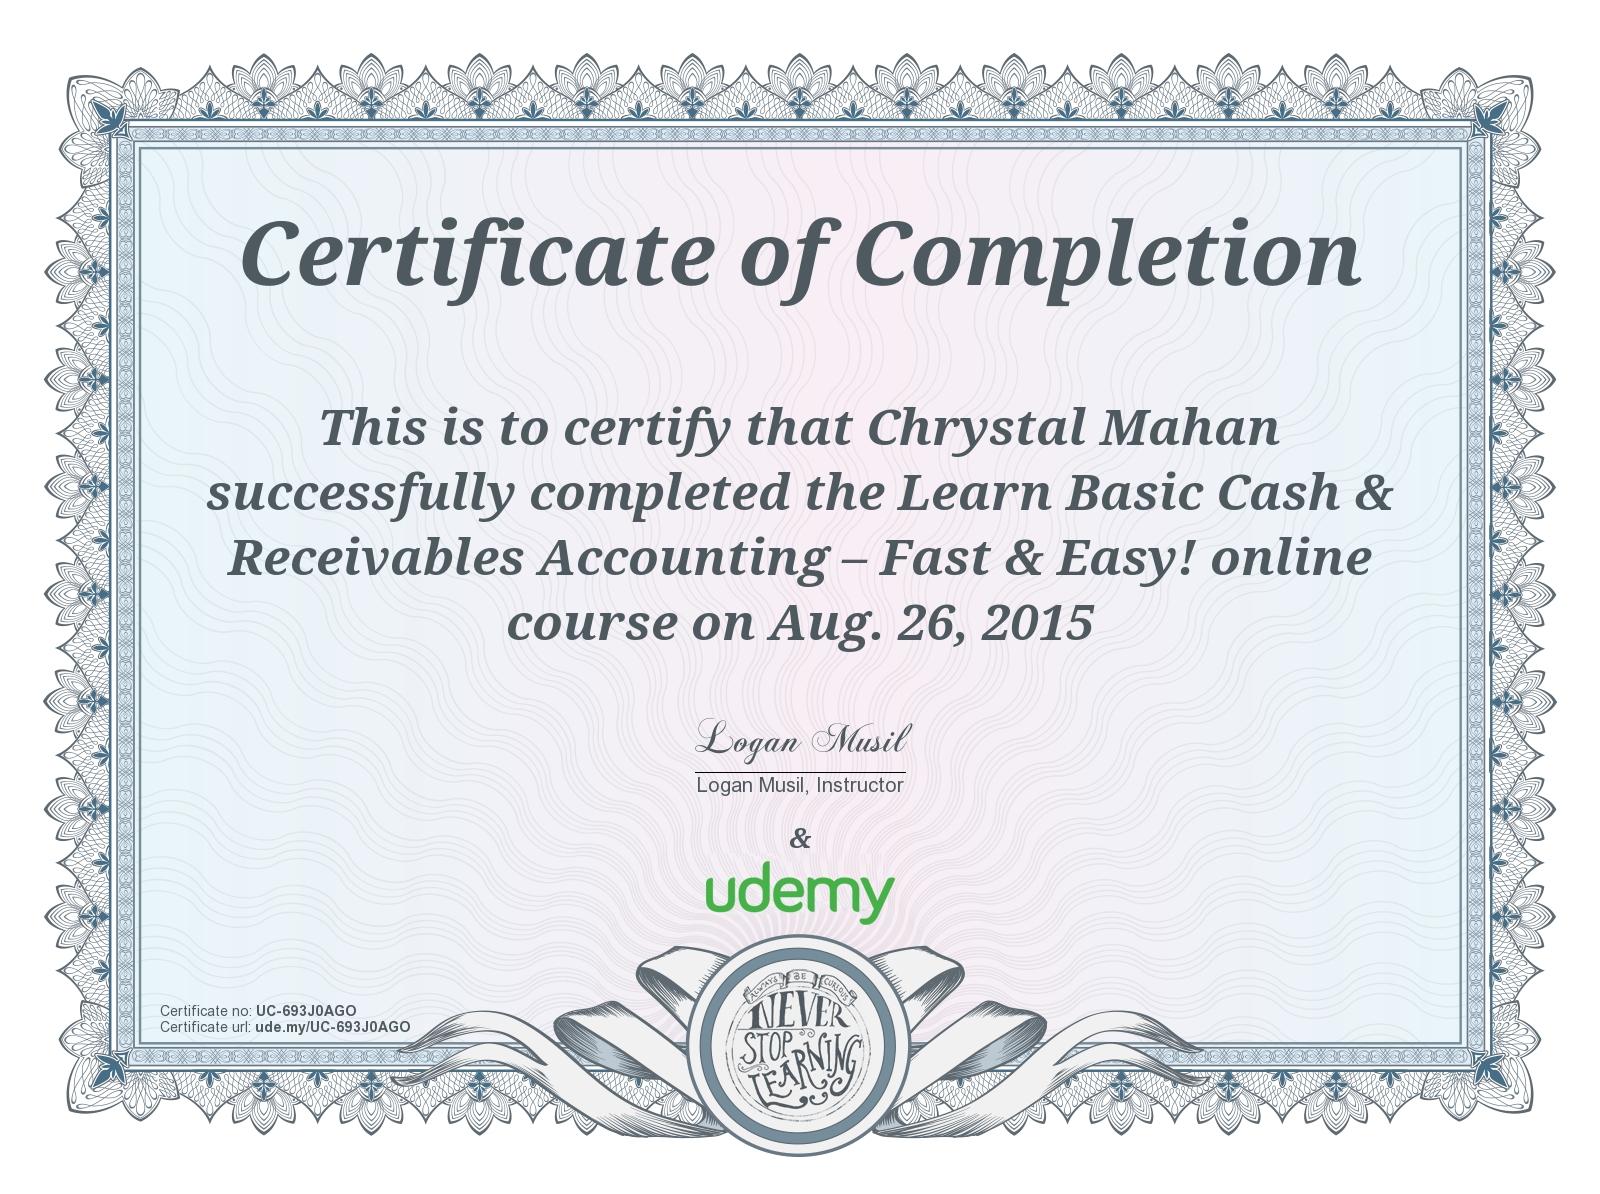 Credentials Chrystal Mahan